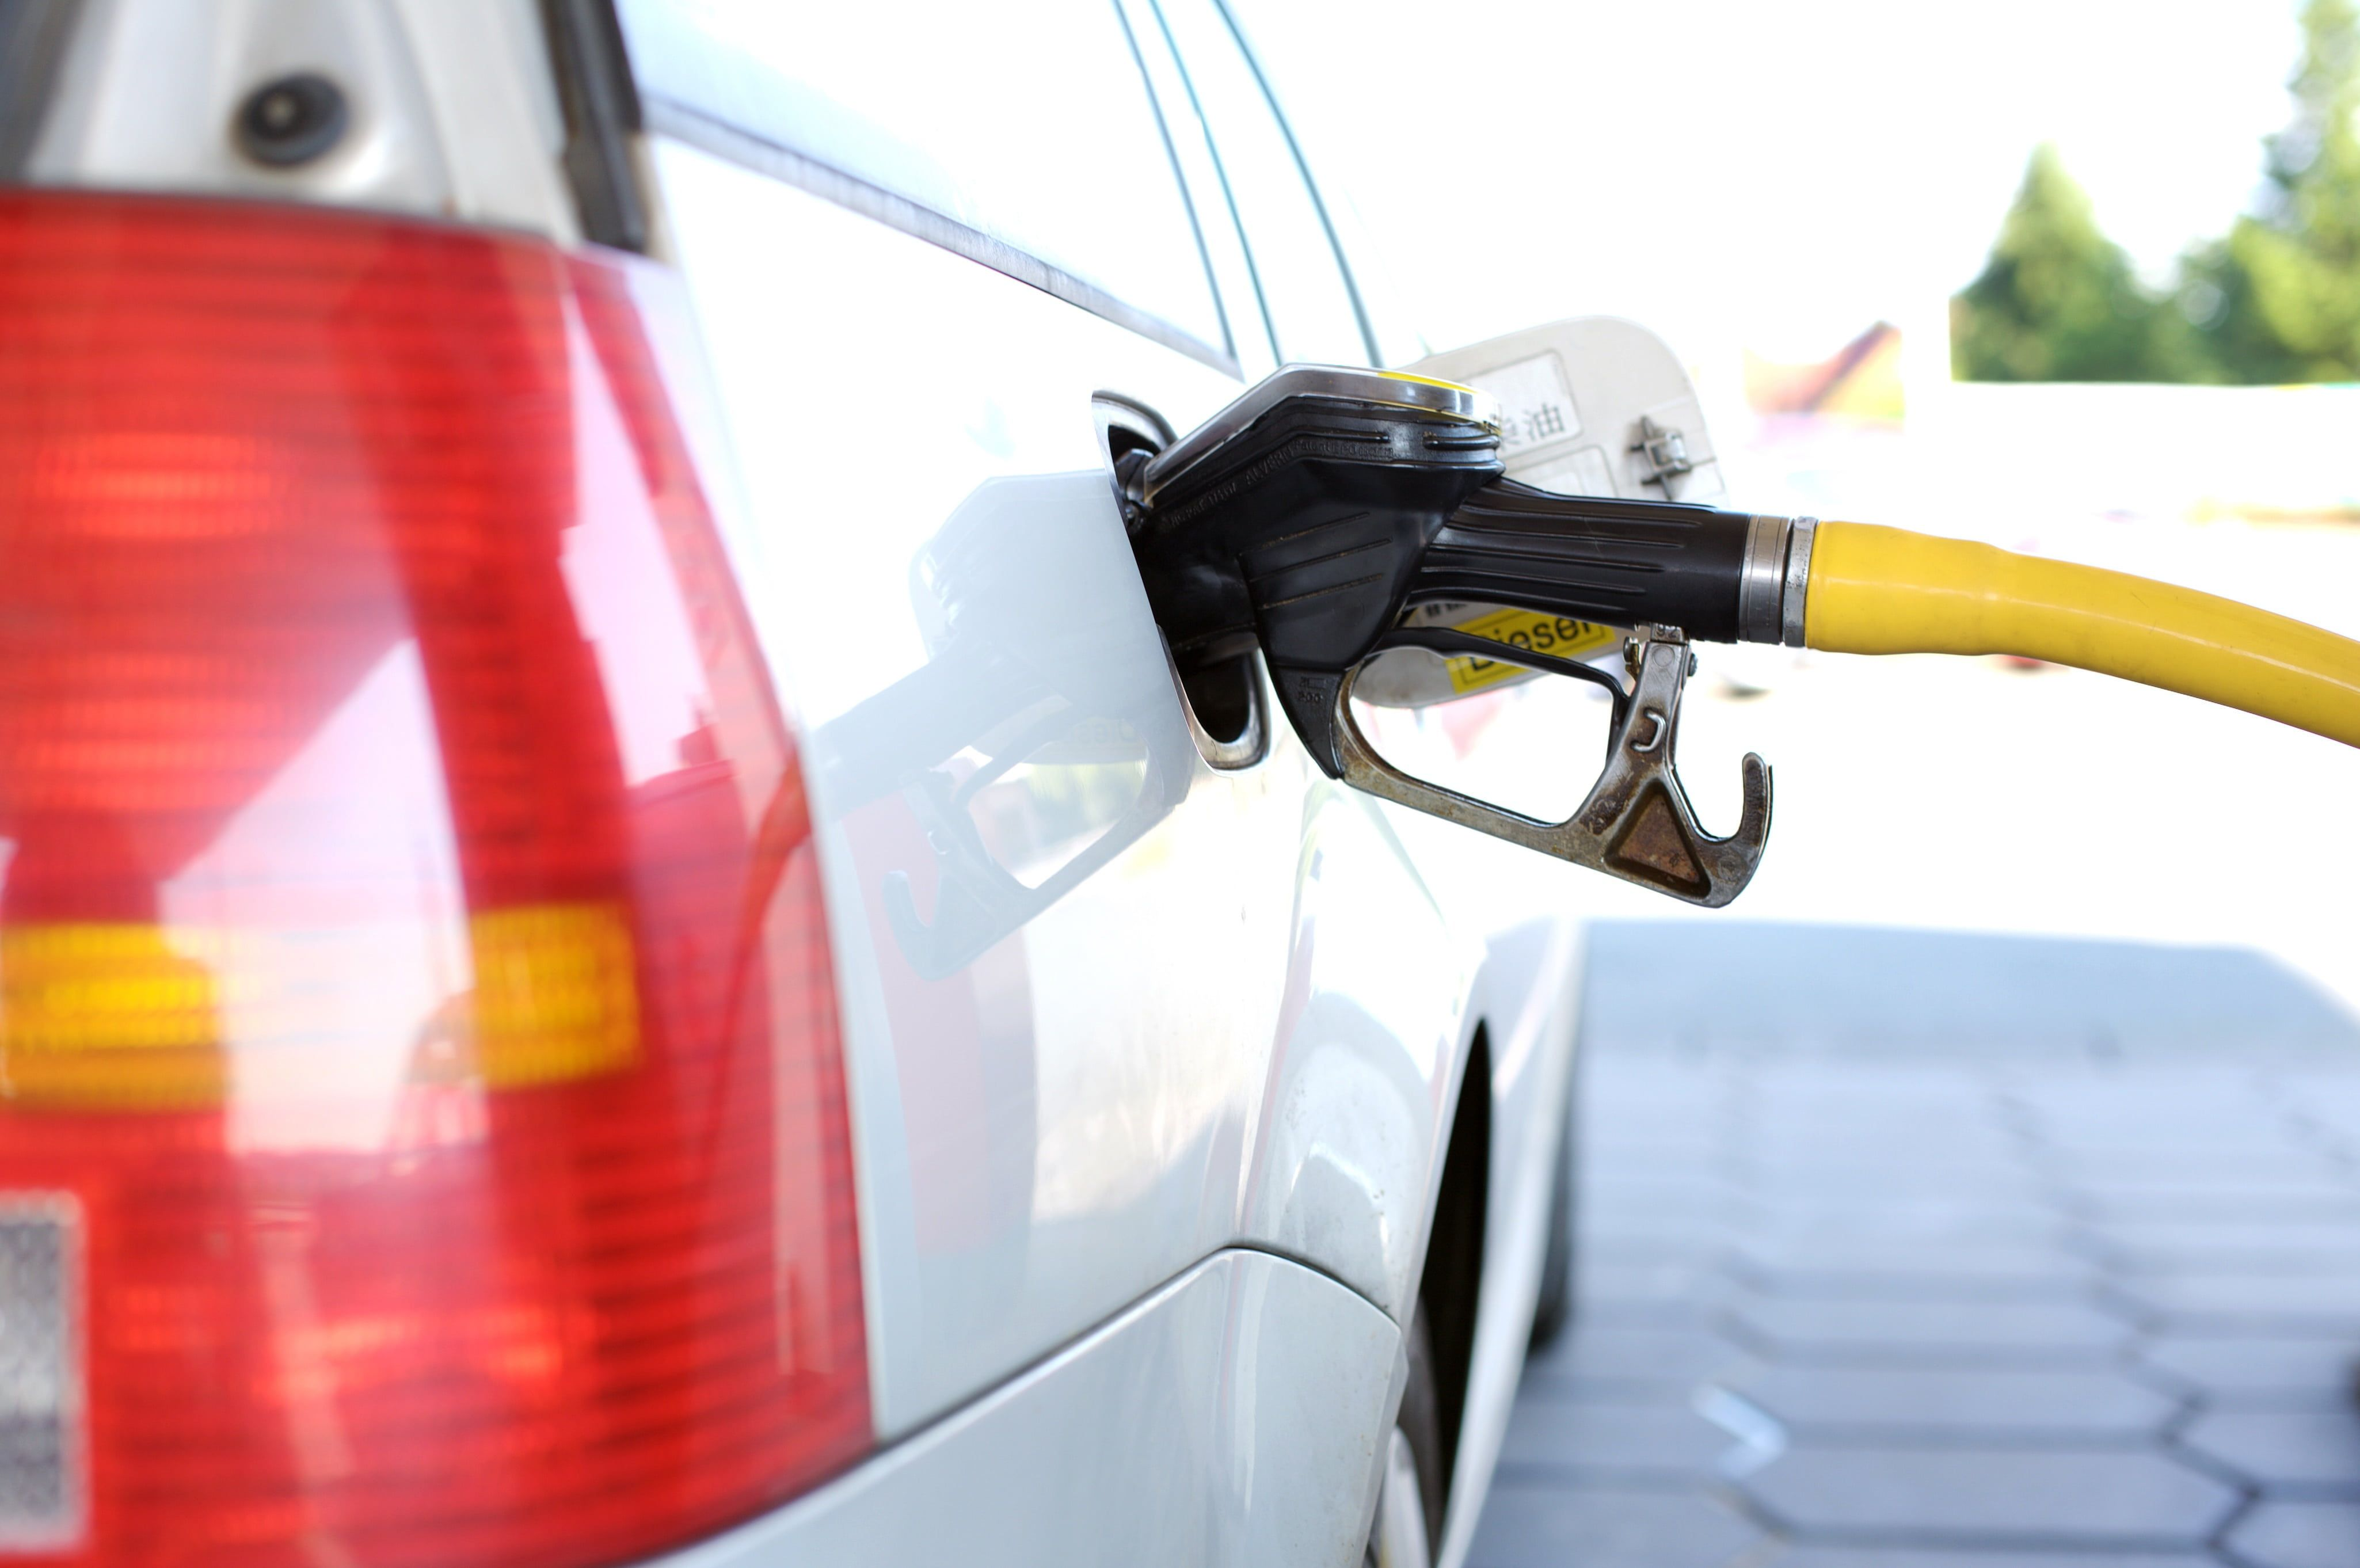 White Vehicle Filling Gas Tank Using Gasoline Pump Refuel